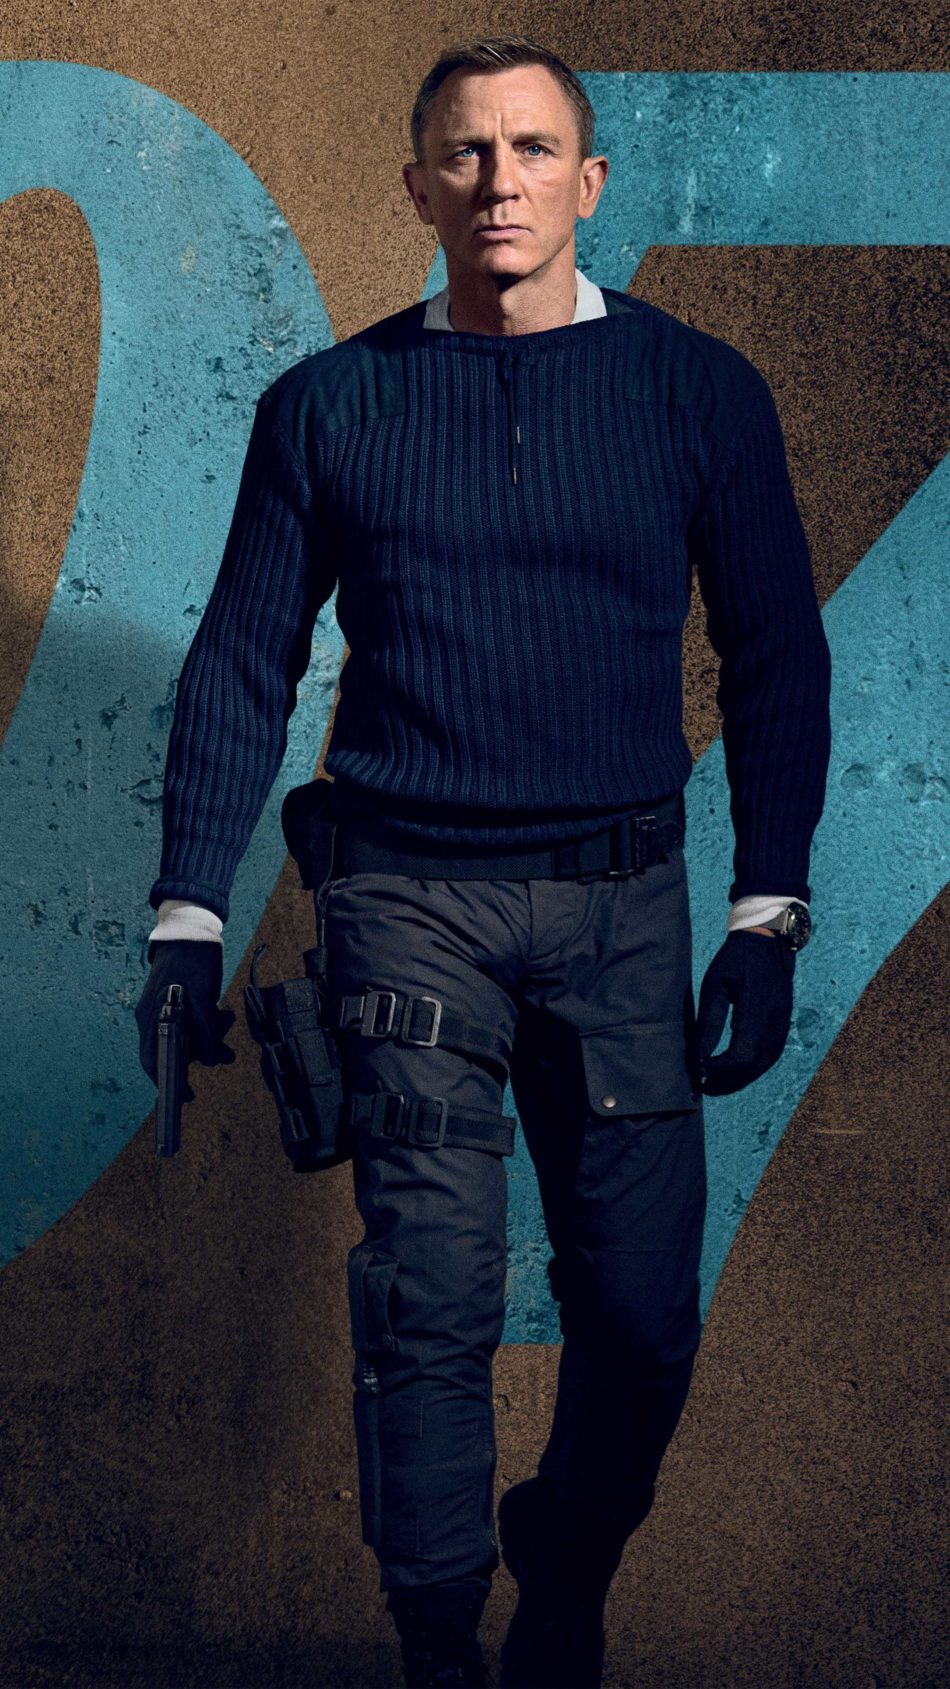 Daniel Craig No Time To Die 2020 Movie 4K Ultra HD Mobile Wallpaper